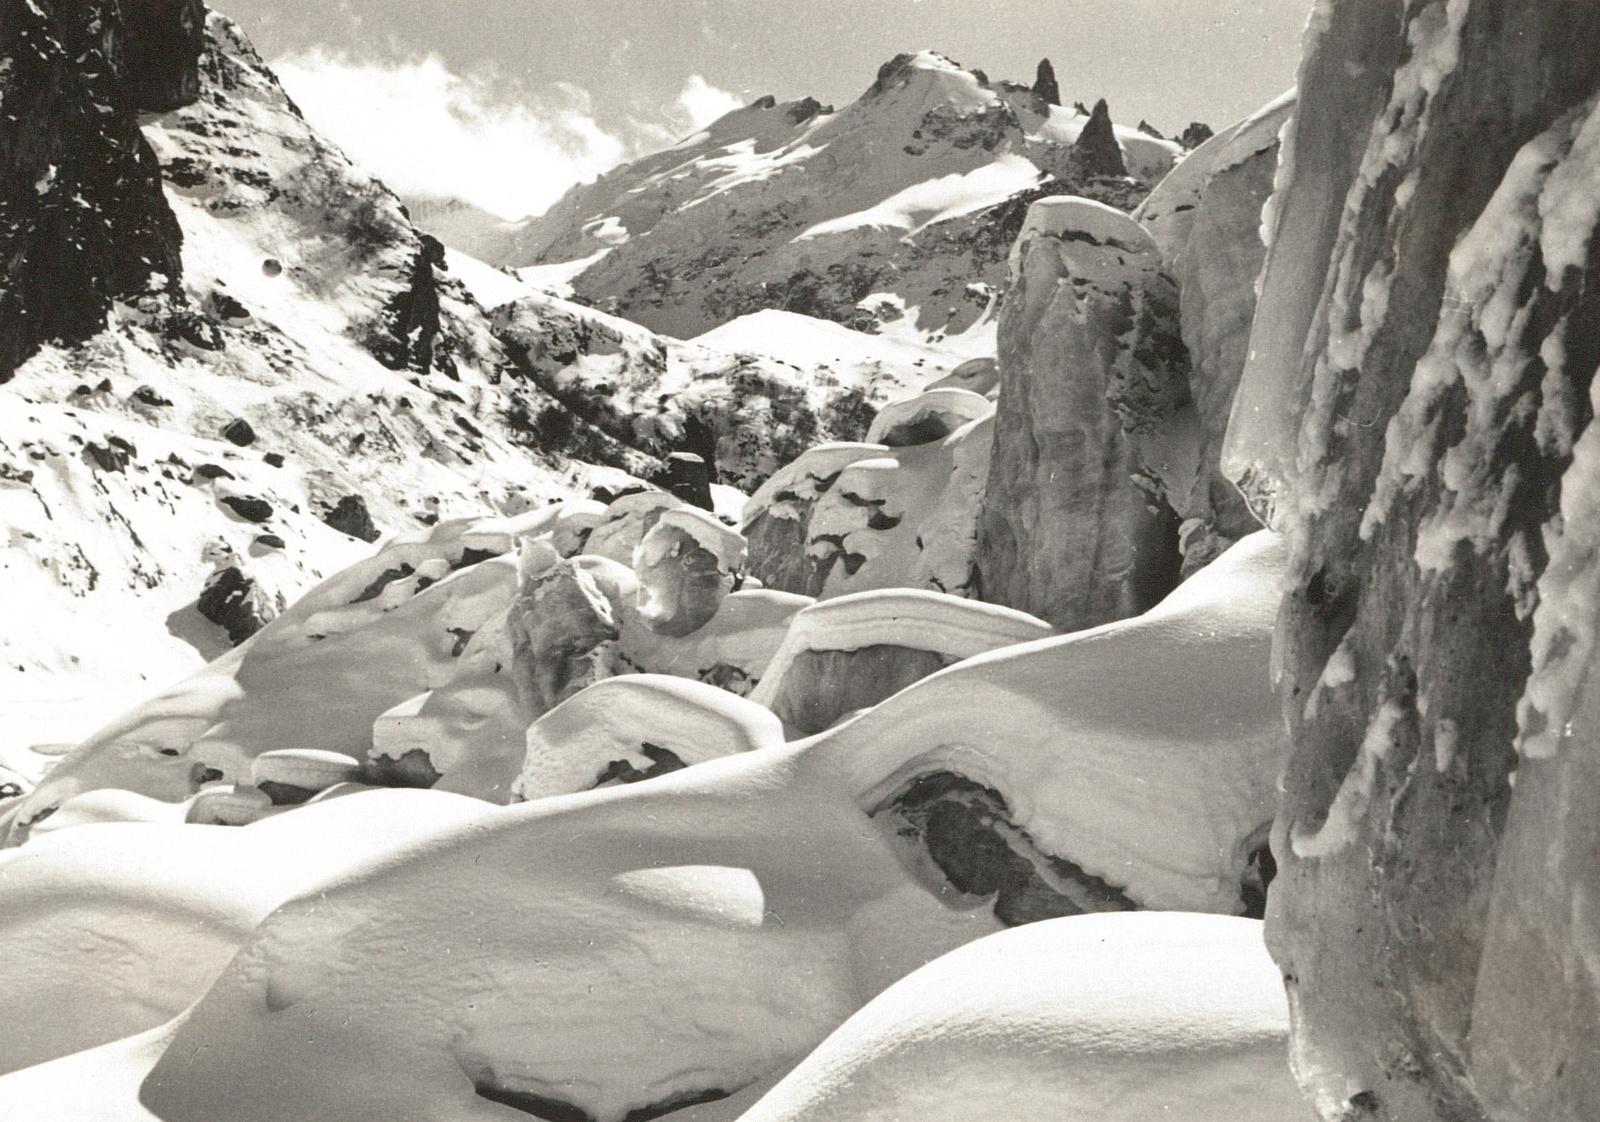 Центральный Кавказ. Верхняя долина Шхельды (3900 м). Ледопад